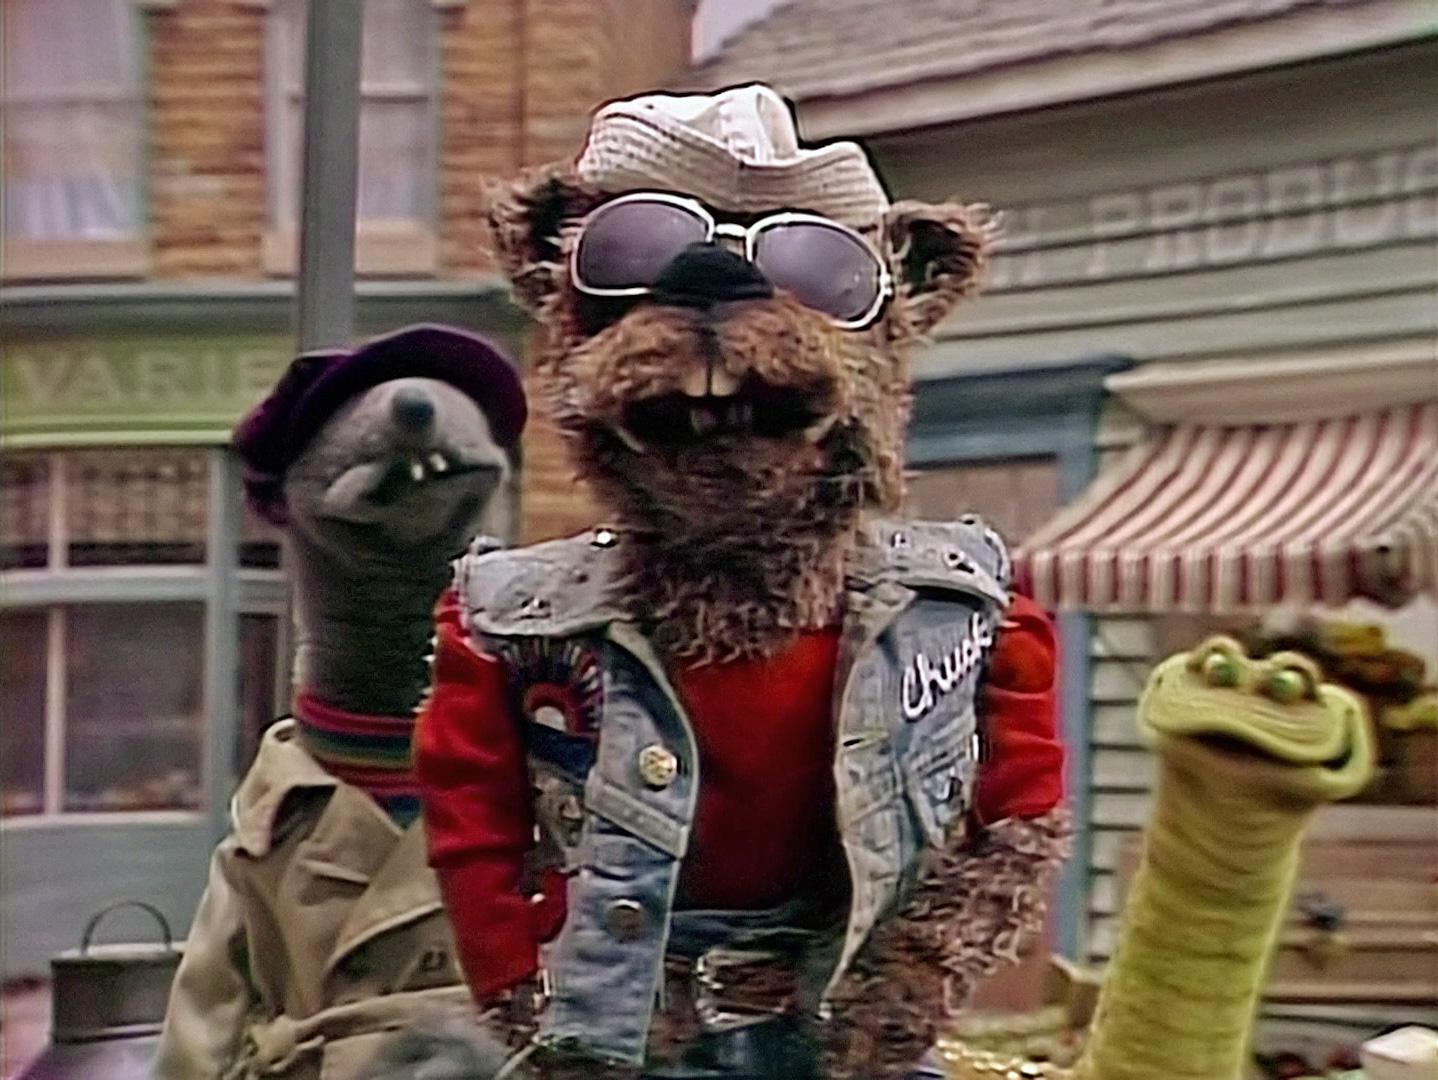 Chuck Stoat | Muppet Wiki | FANDOM powered by Wikia